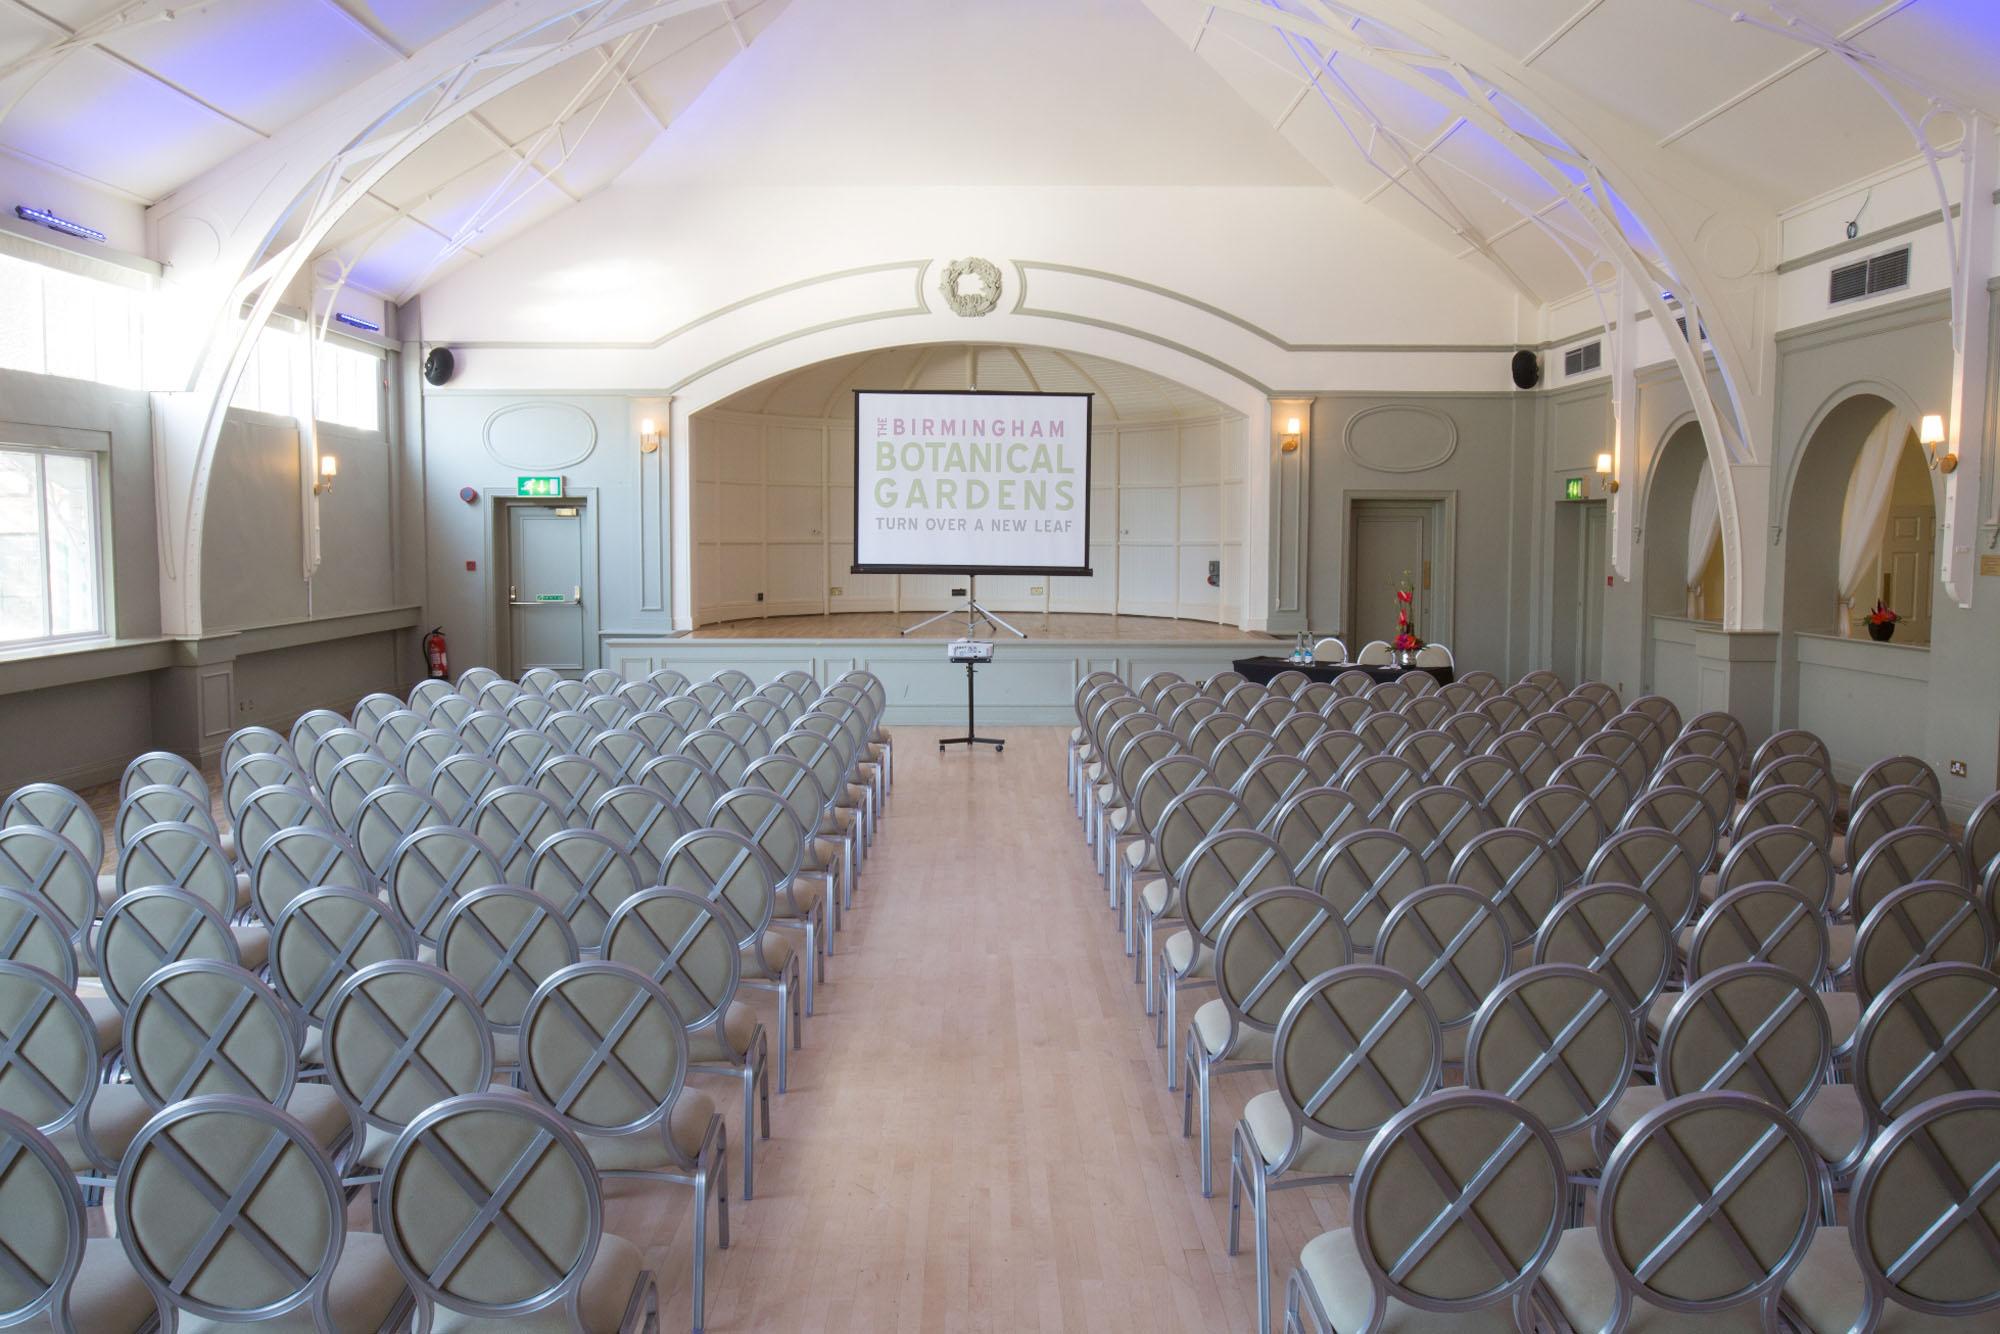 Birmingham botanical gardens corporate events for Terrace theatre